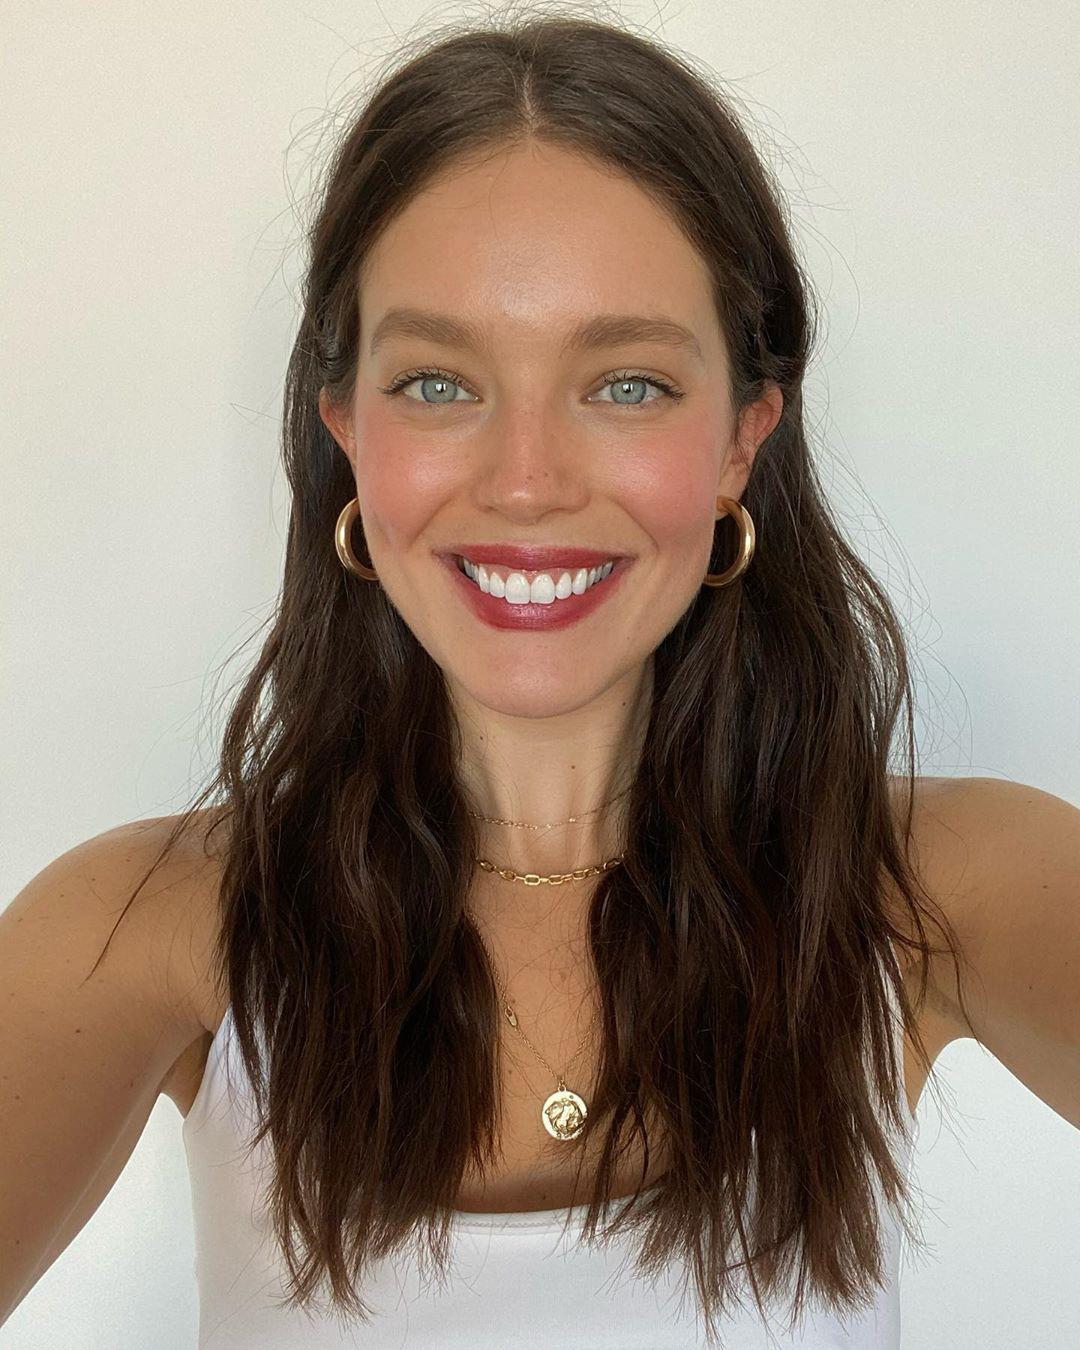 Emily DiDonato Cute Face, Natural Lips, Long Hair Girl